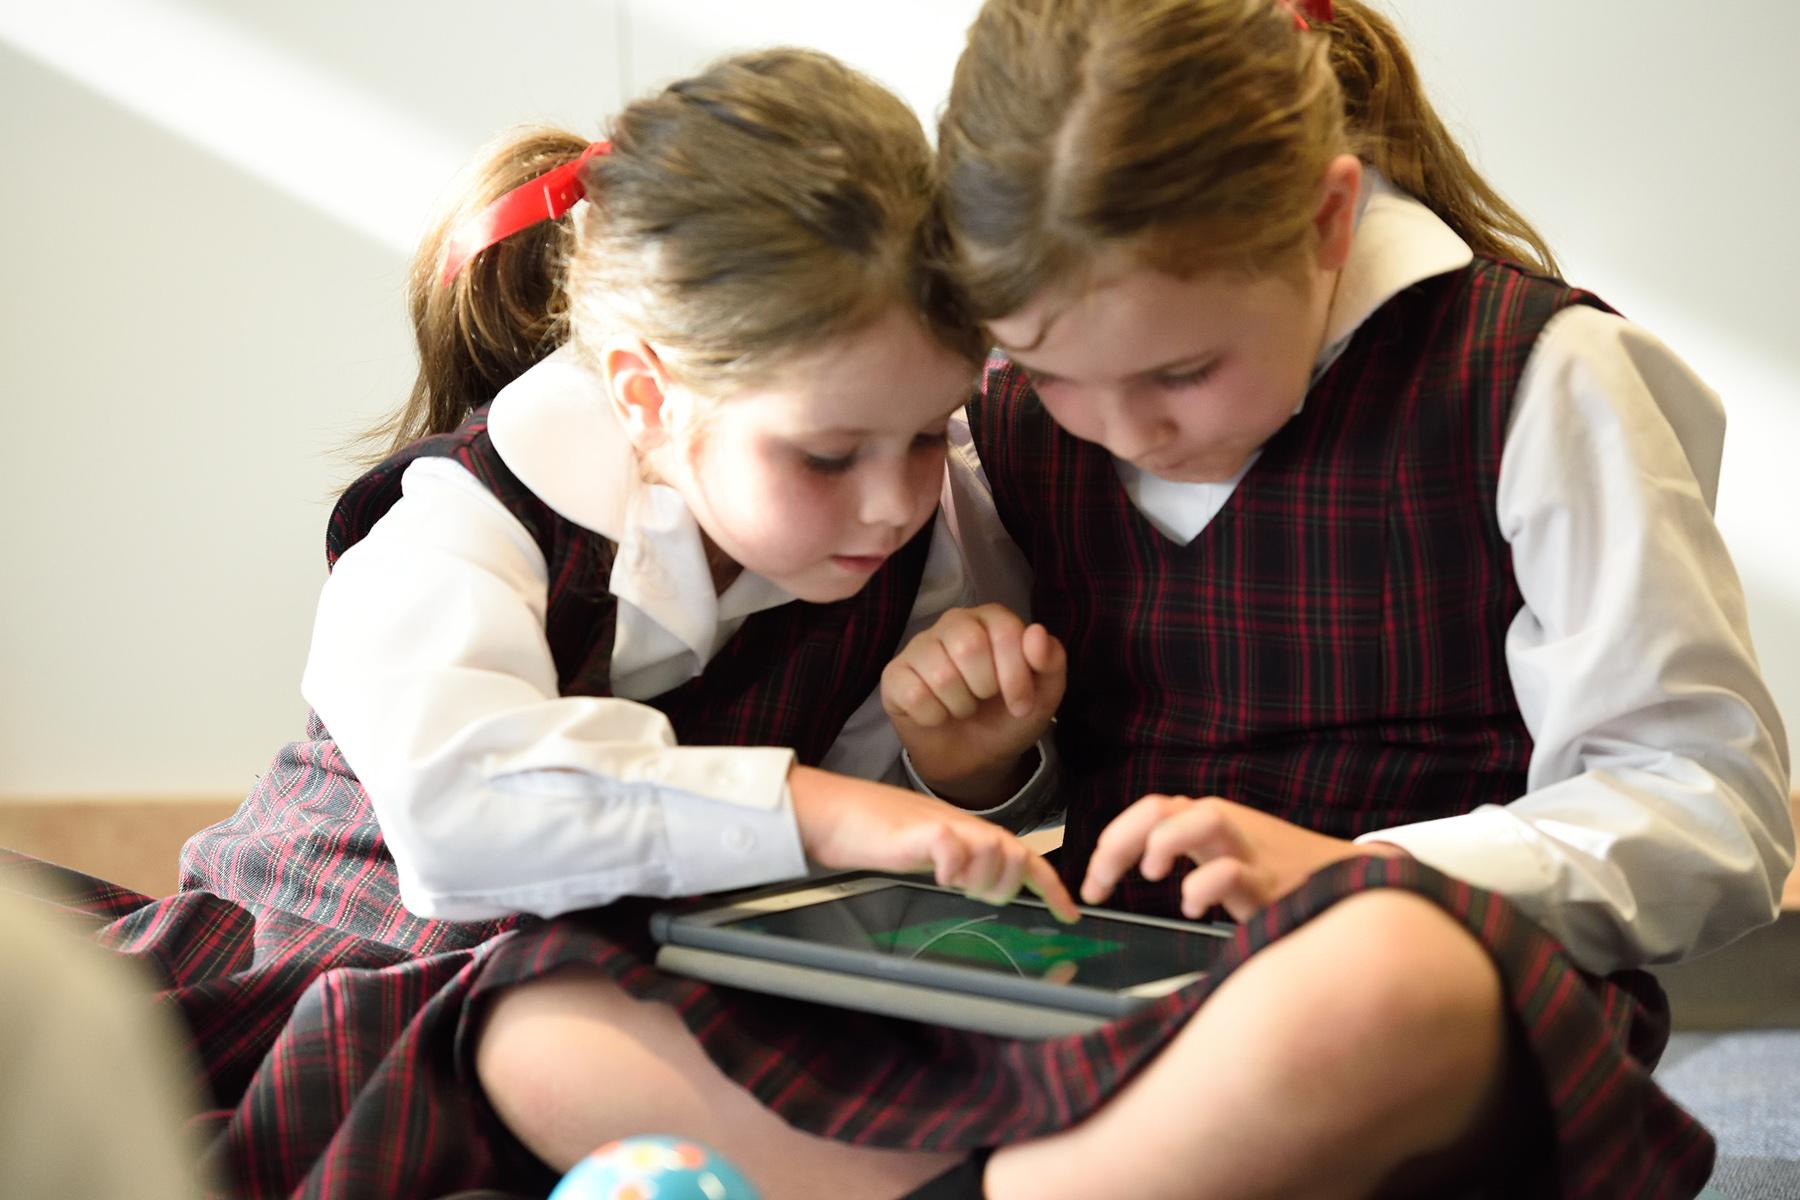 Schoolchildren using a tablet at school